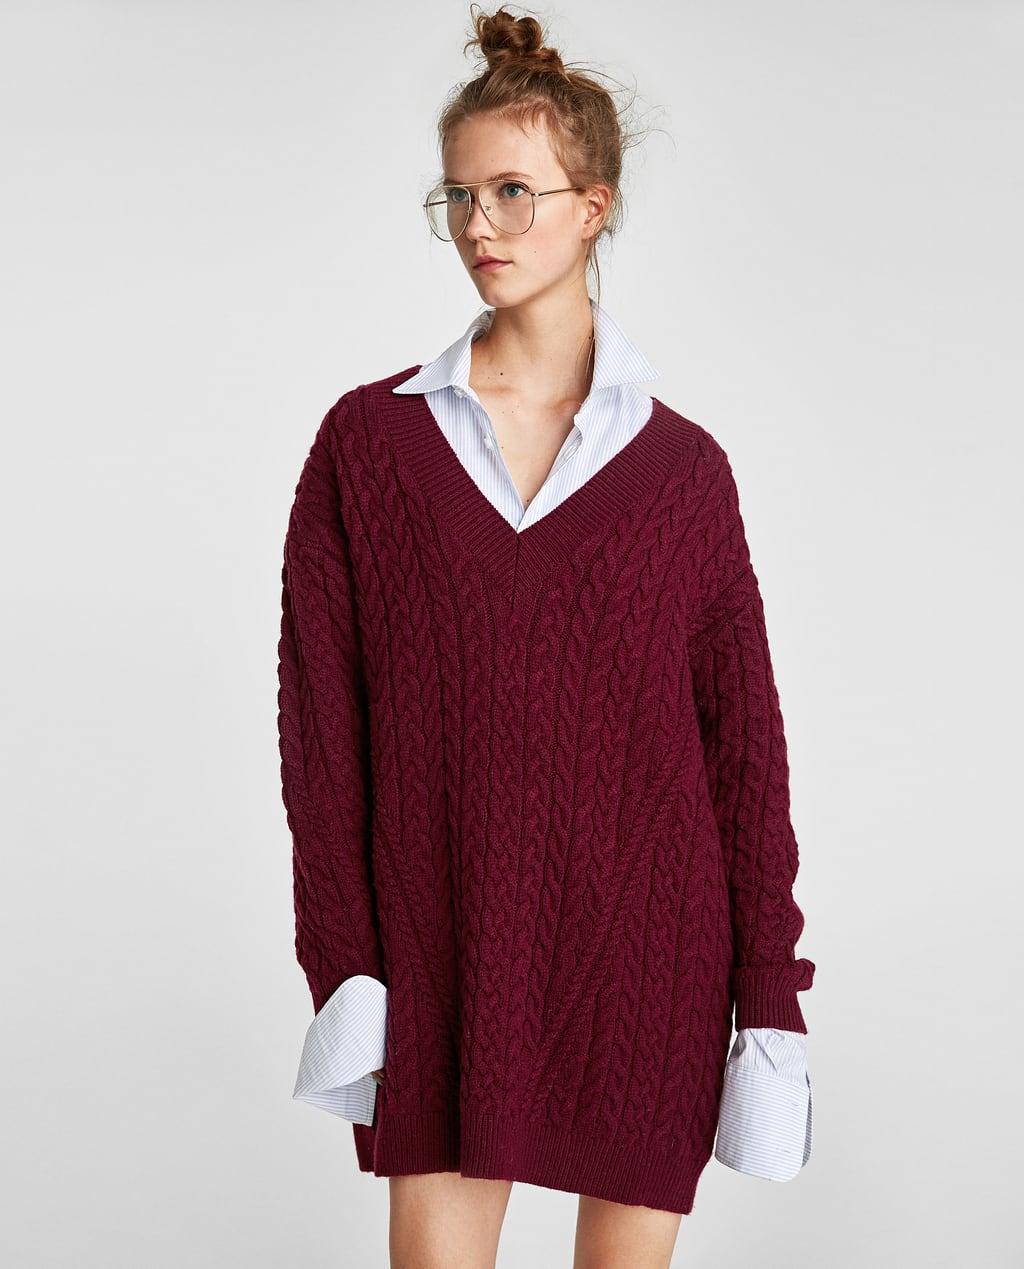 CABLE - KNIT V-NECK SWEATER-Sweaters-KNITWEAR-WOMAN-SALE | ZARA ...